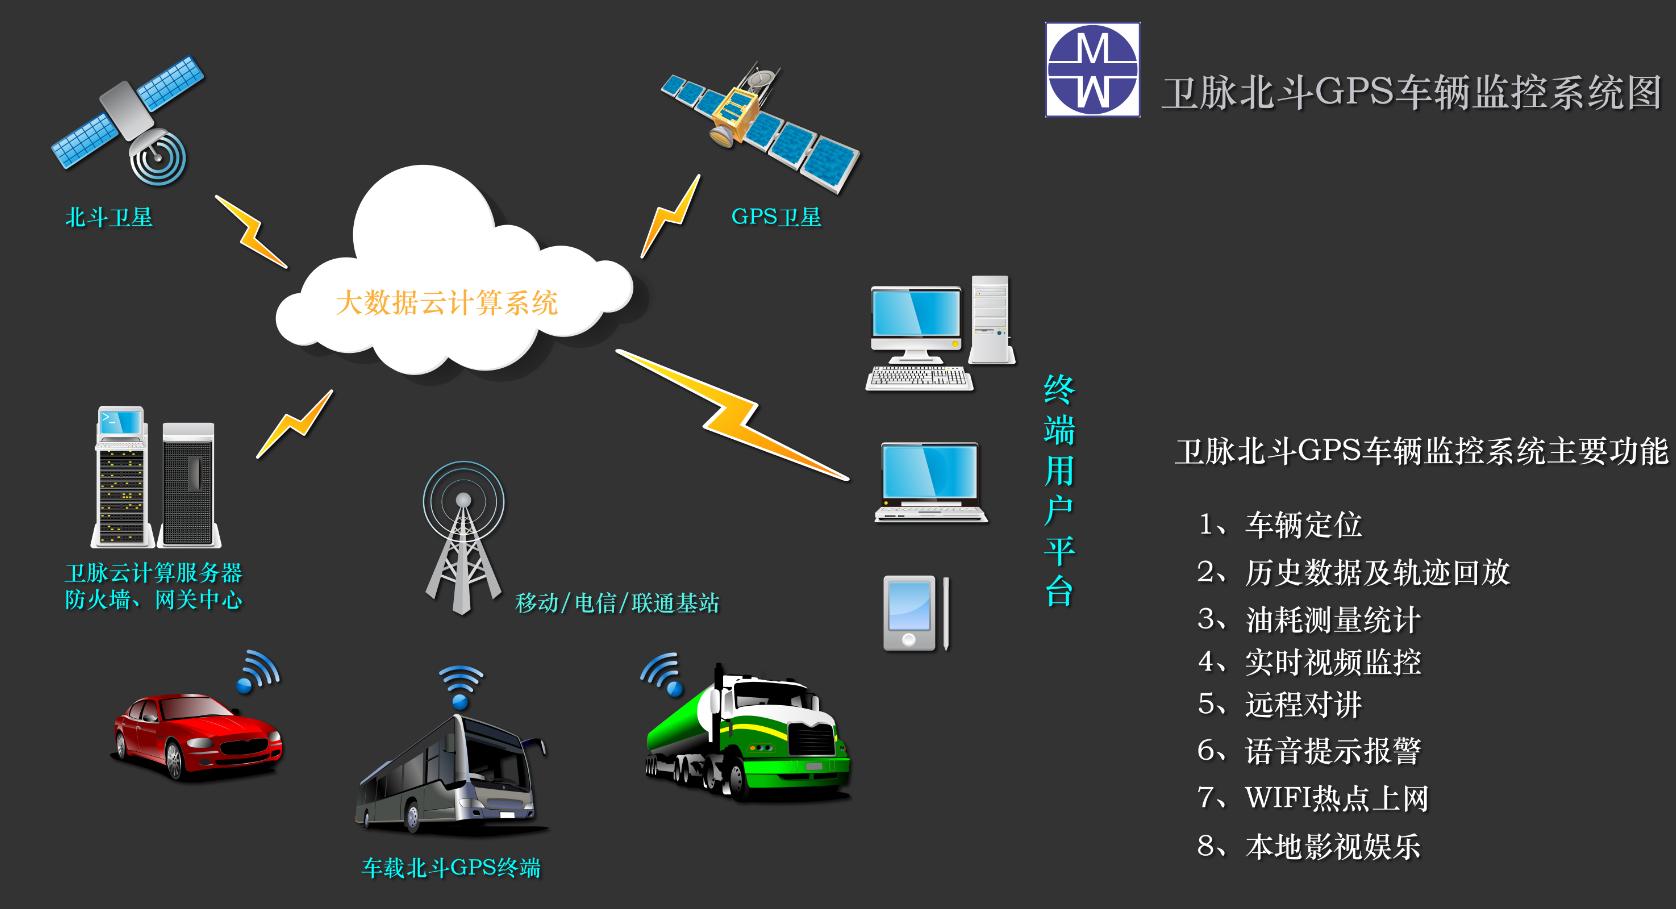 GPS北斗解決方案系统图